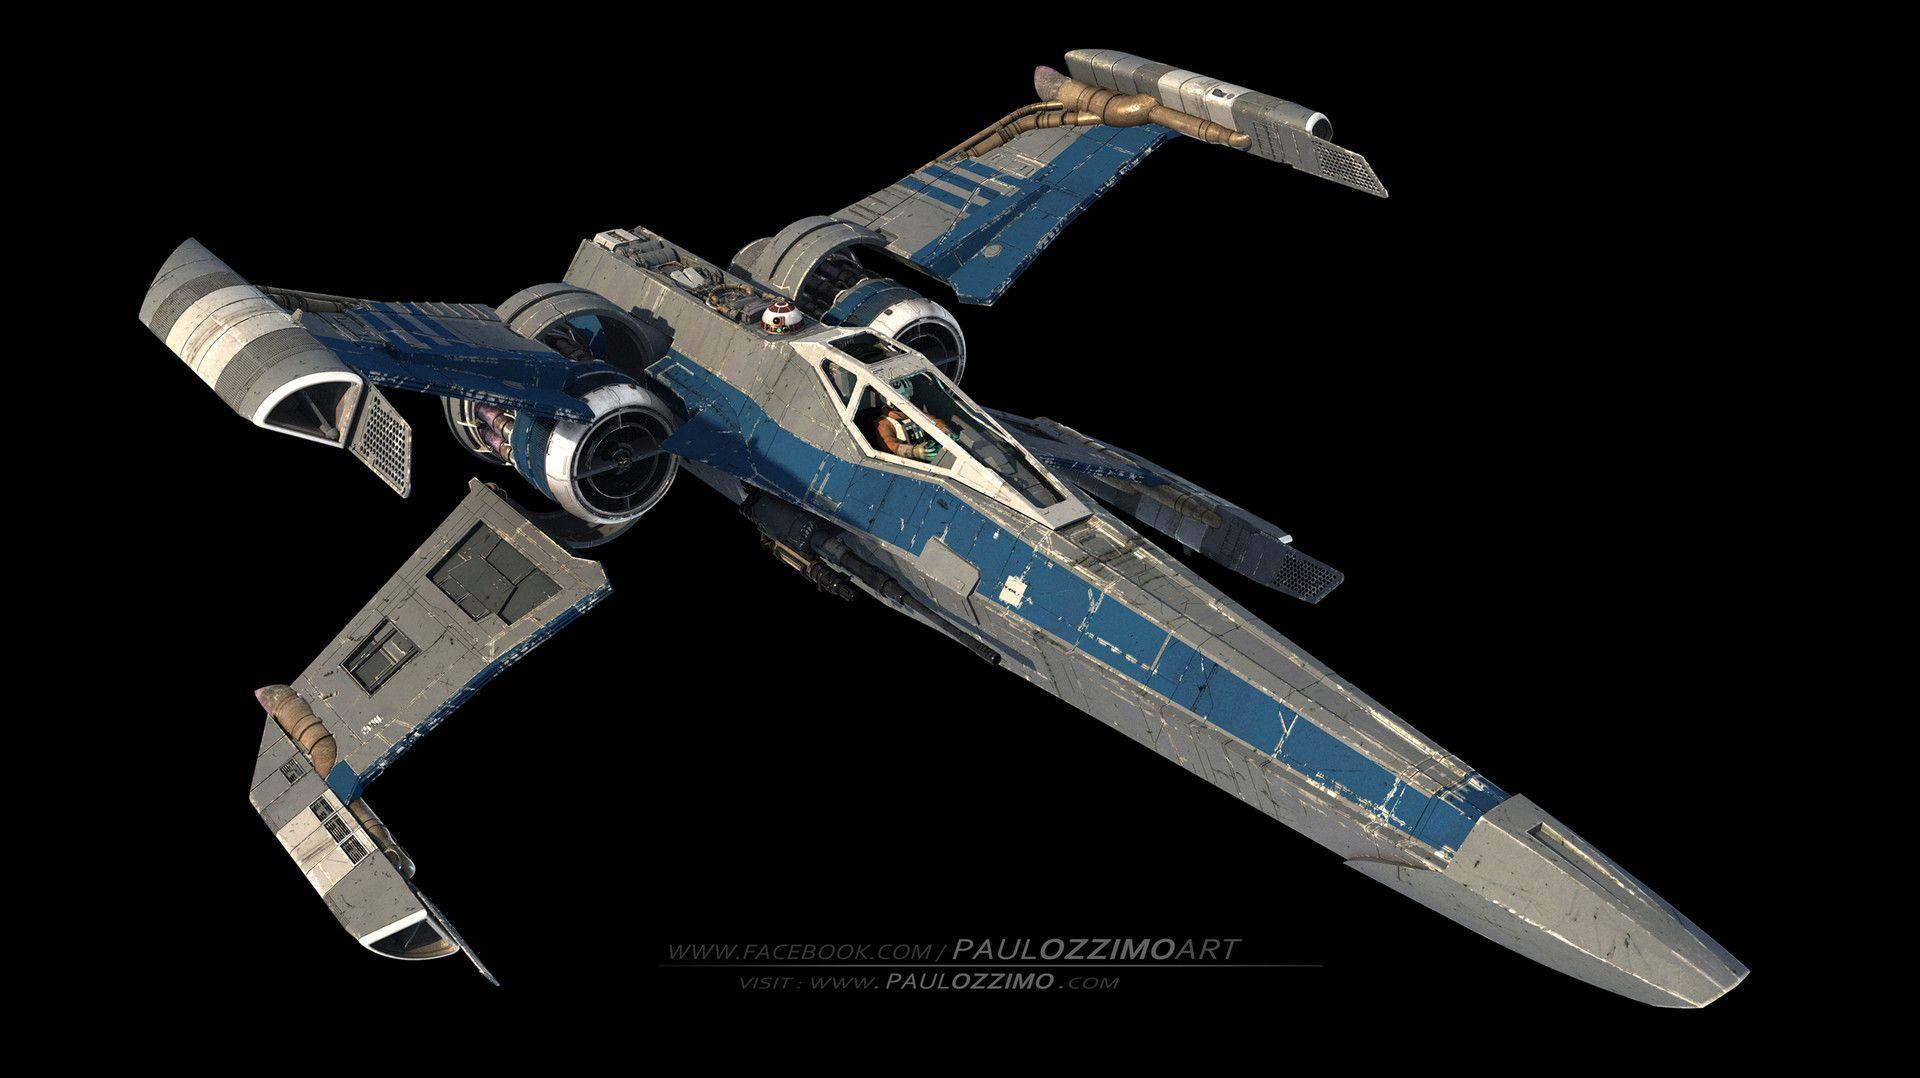 X Wing Concept Exploration Paul Ozzimo Star Wars Vehicles Star Wars Ships Star Wars Ships Design